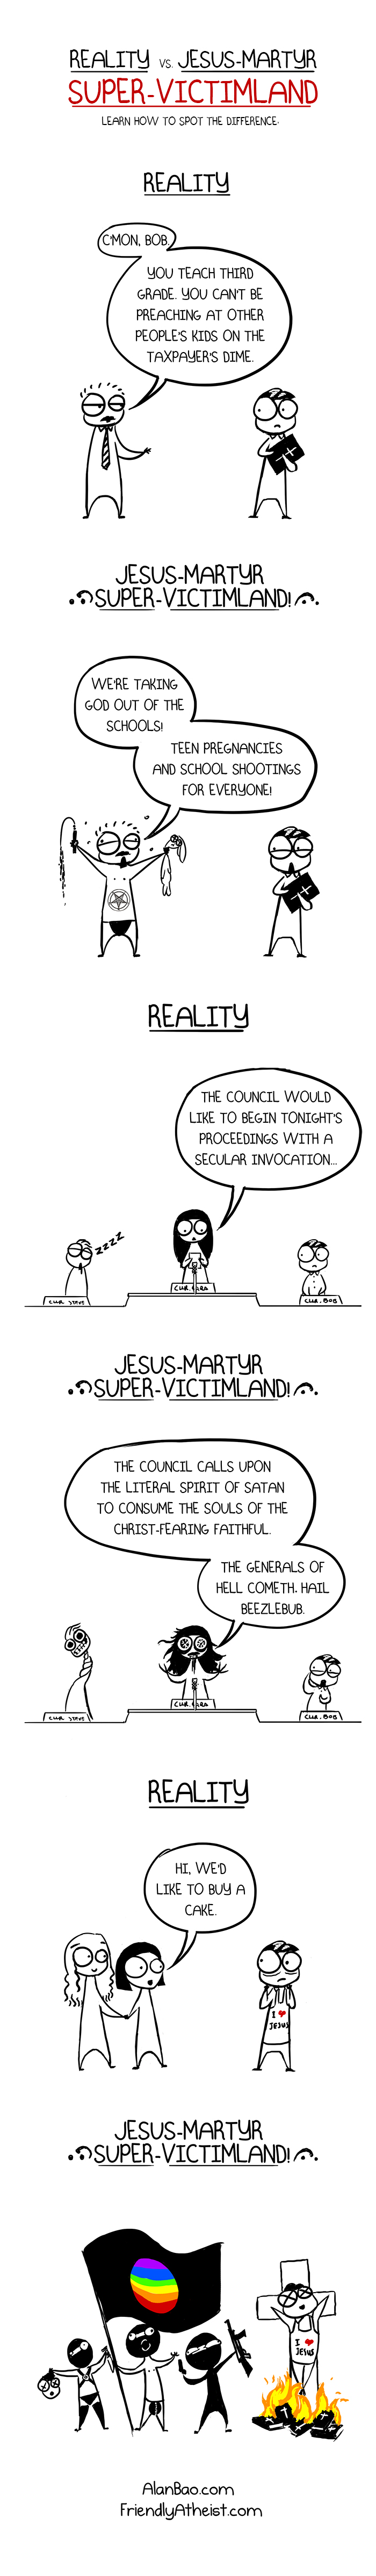 13 - Jesus-Martyr Super-Victimland Flattened2